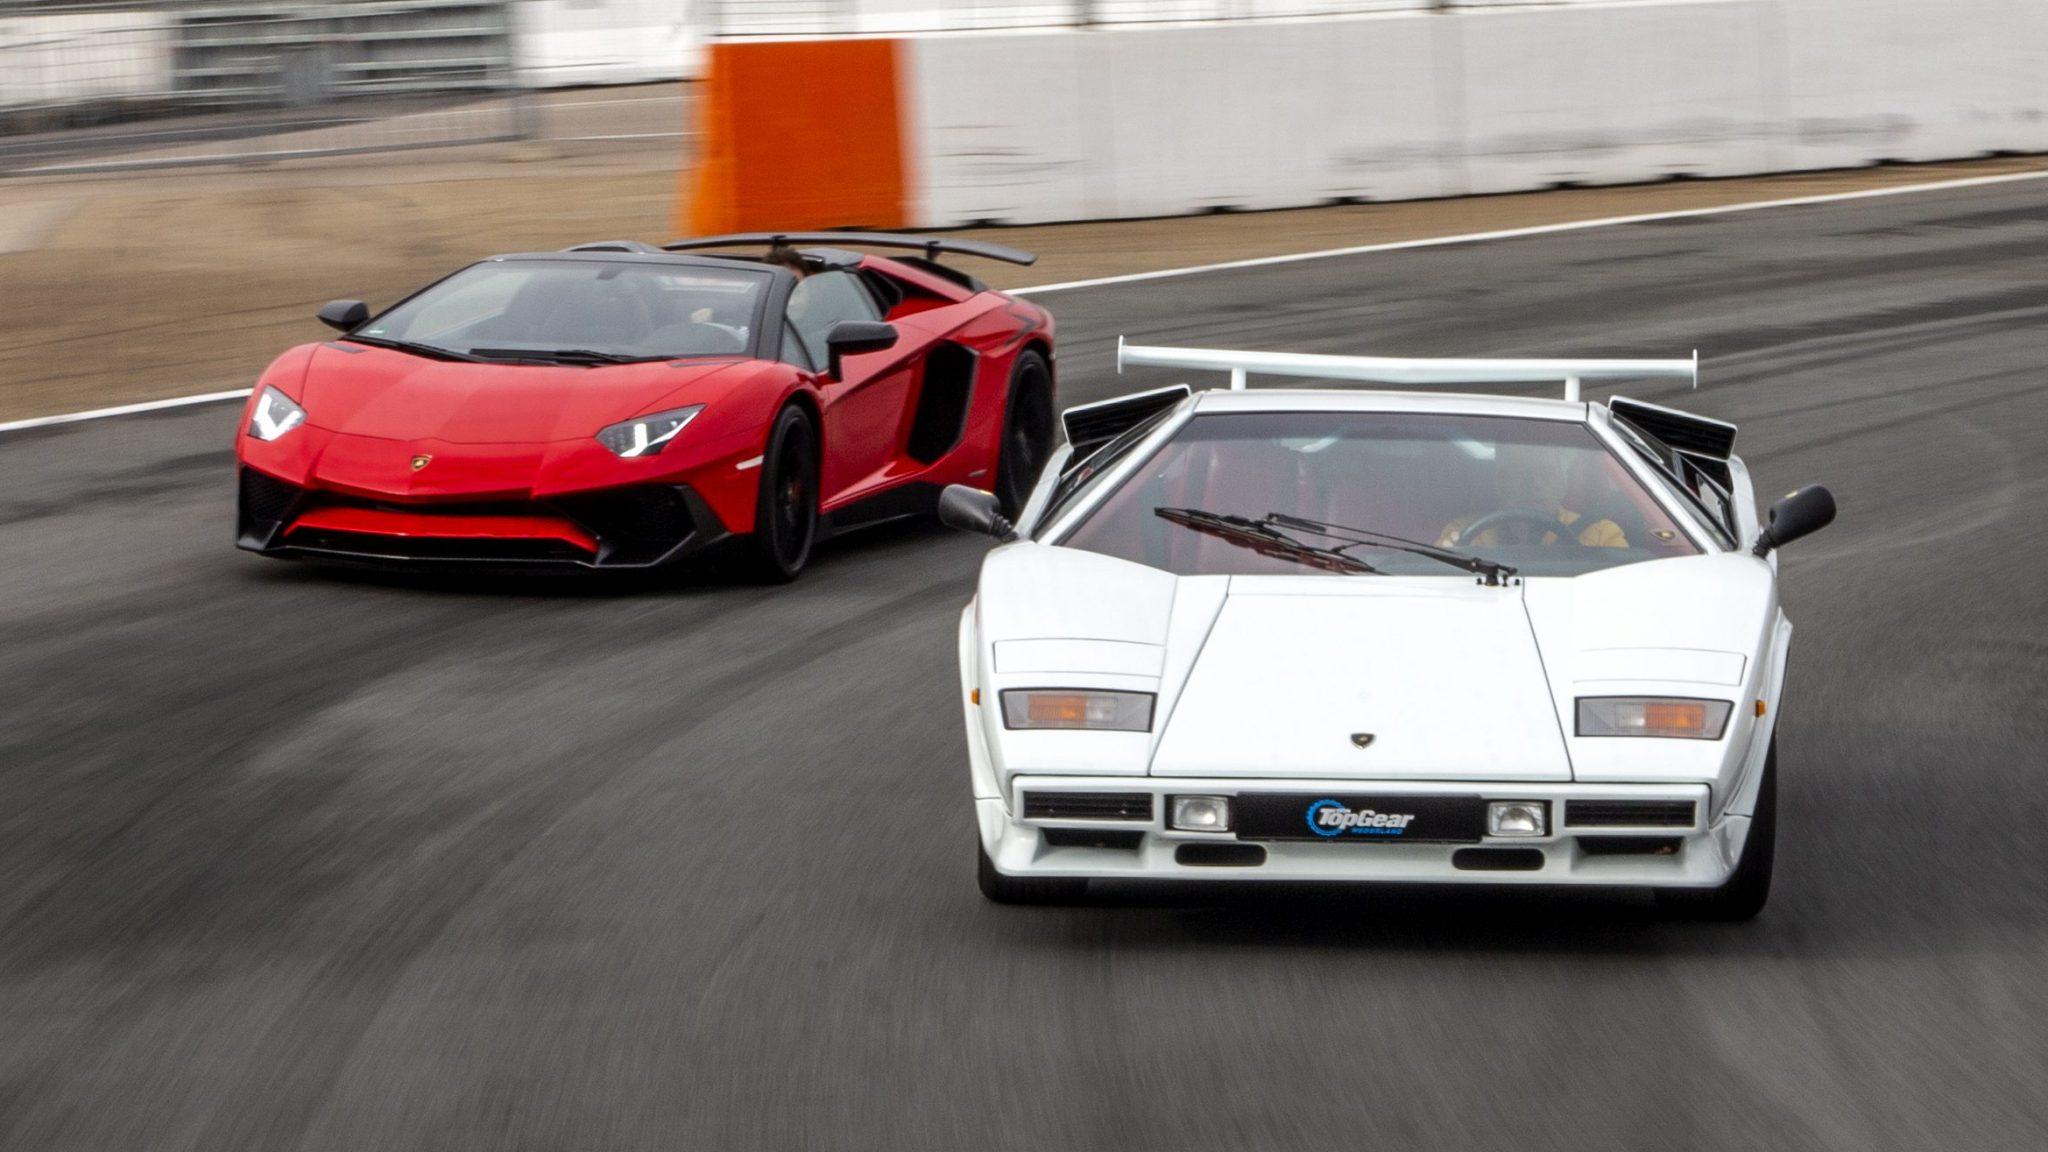 Lamborghini Aventador SV Roadster vs Lamborghini Countach 5000 QV